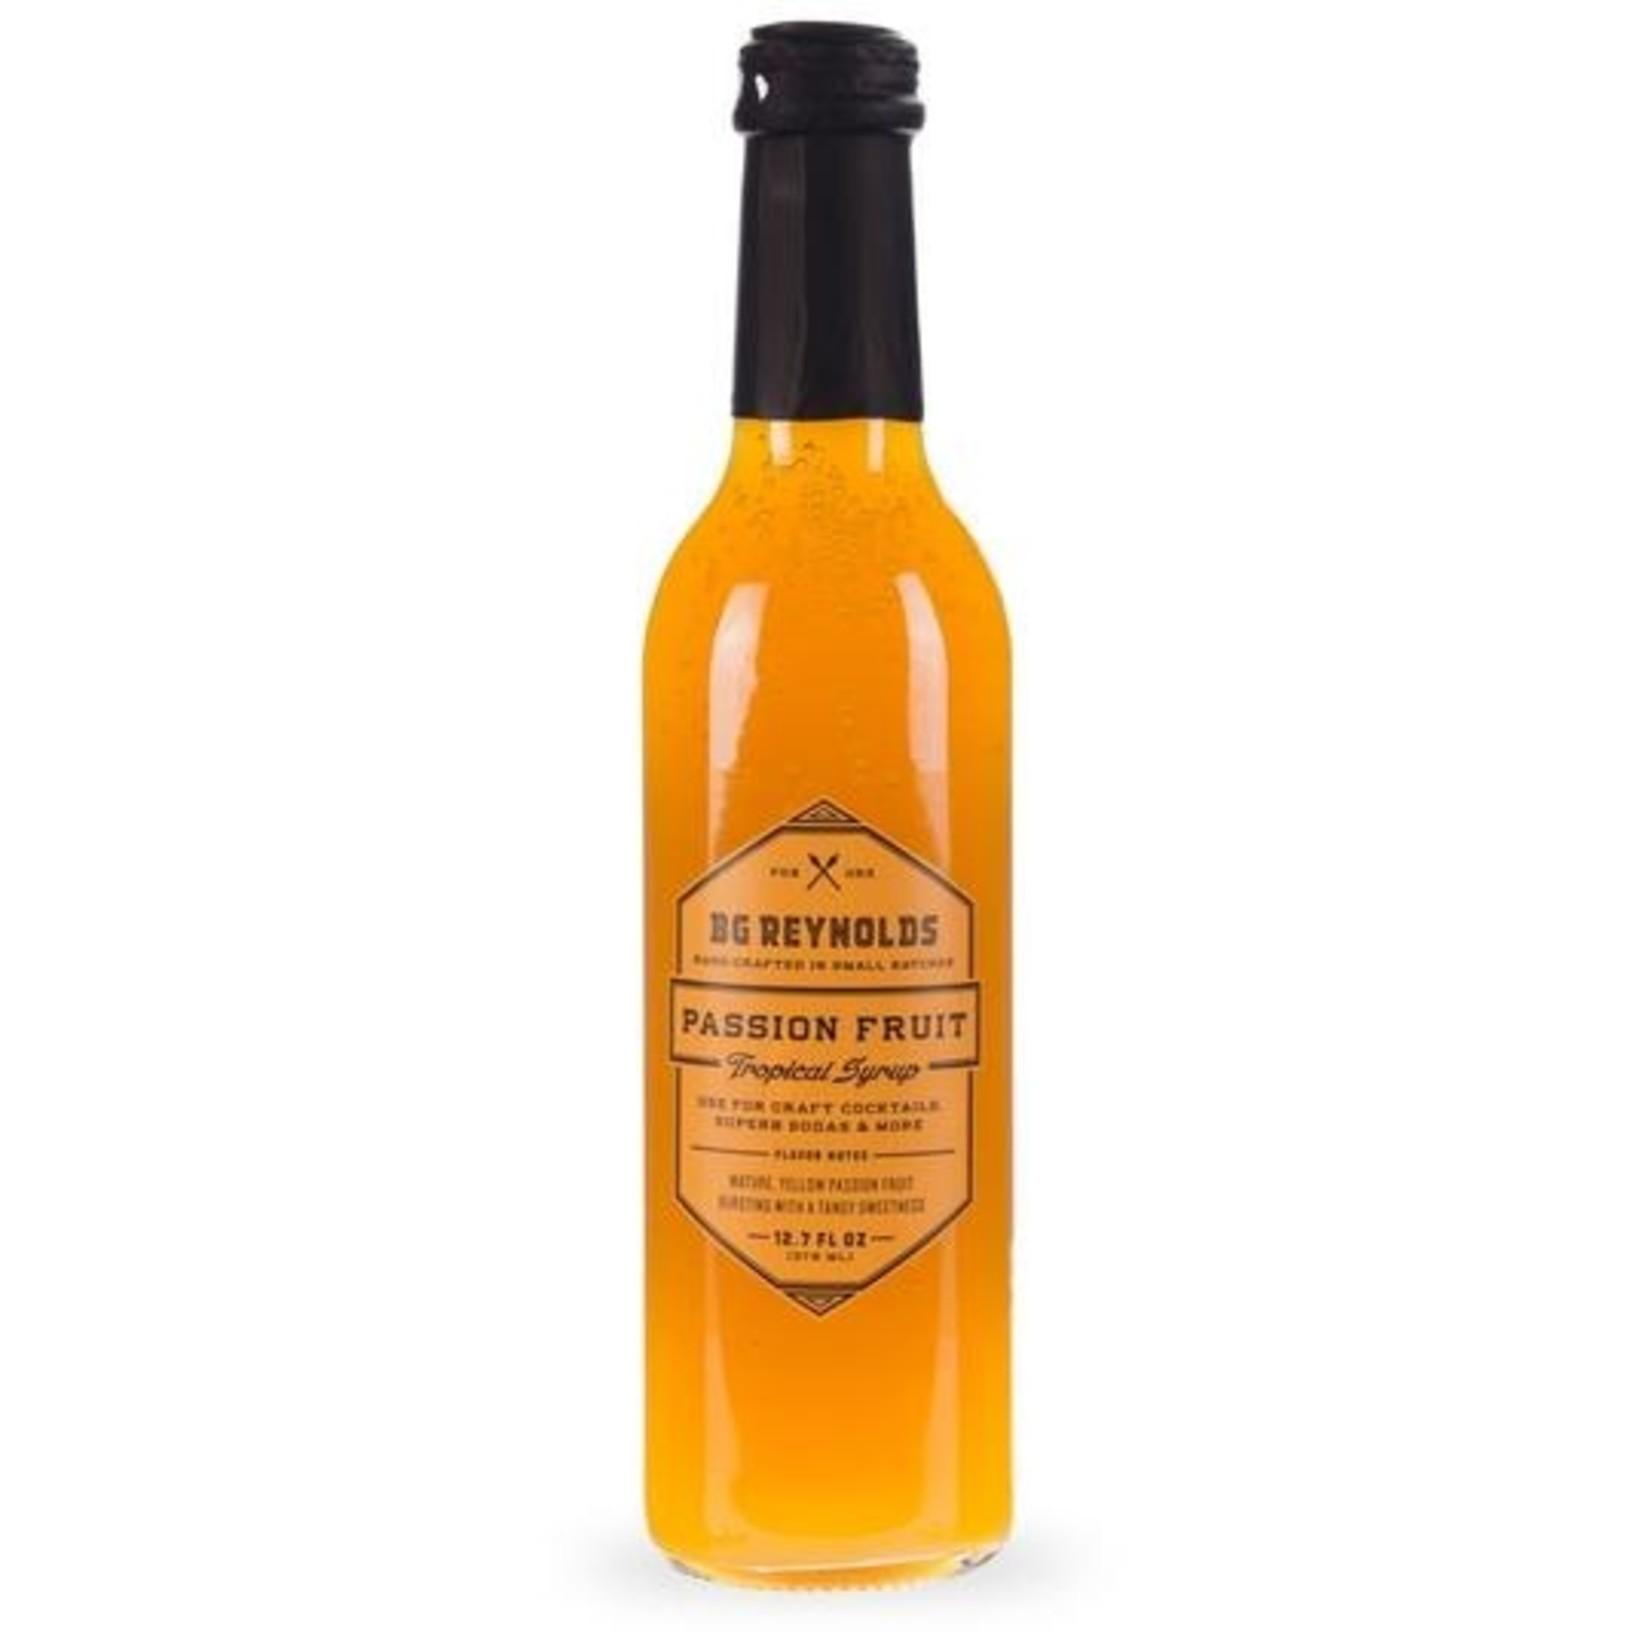 BG Reynolds BG Reynolds Syrup Passion Fruit 375ml